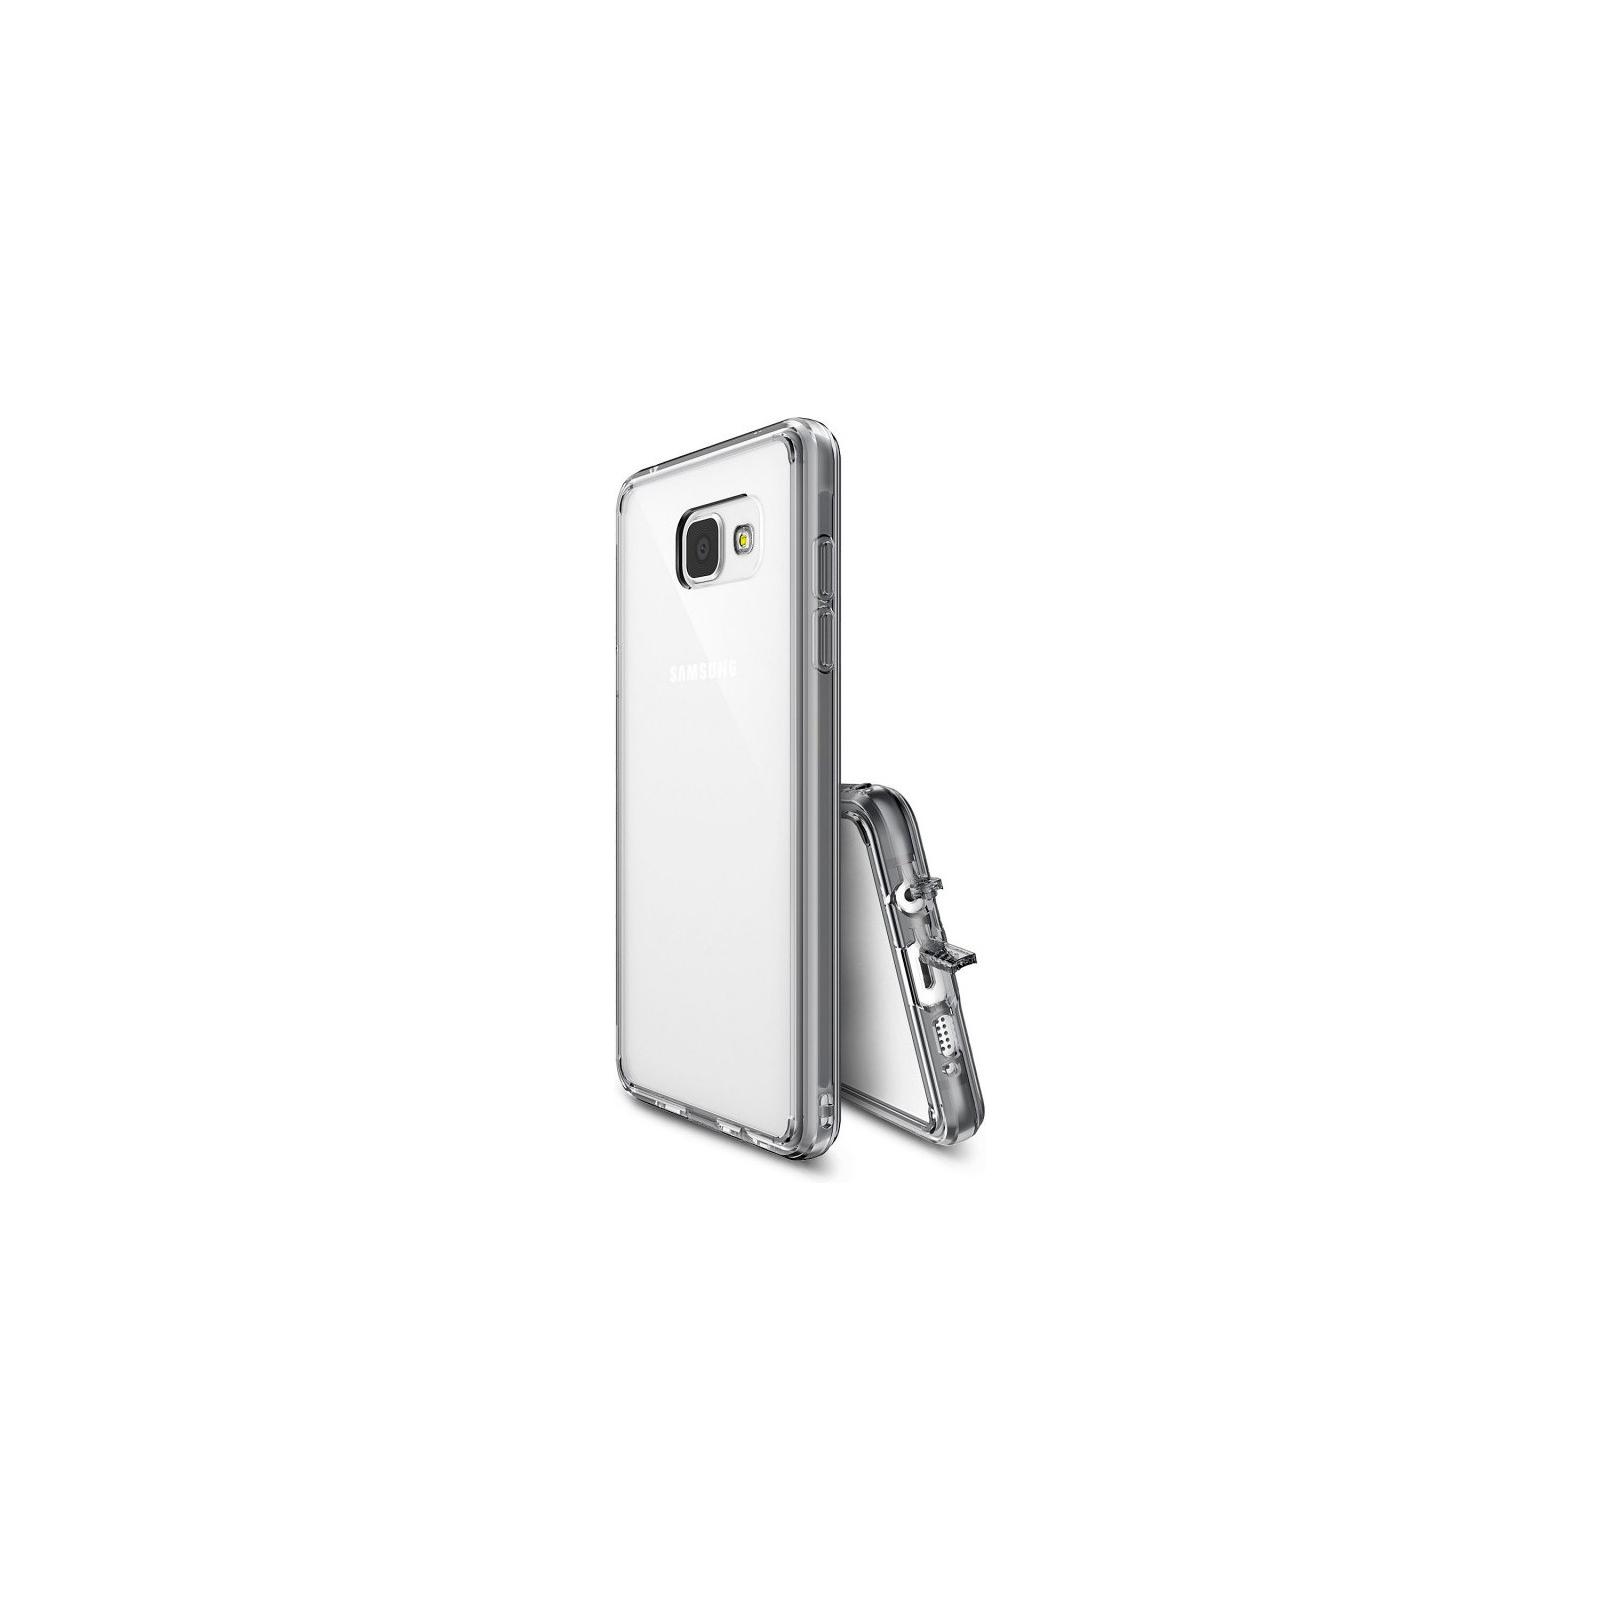 Чехол для моб. телефона Ringke Fusion для Samsung Galaxy A7 2016 Smoke Black (820002) изображение 2